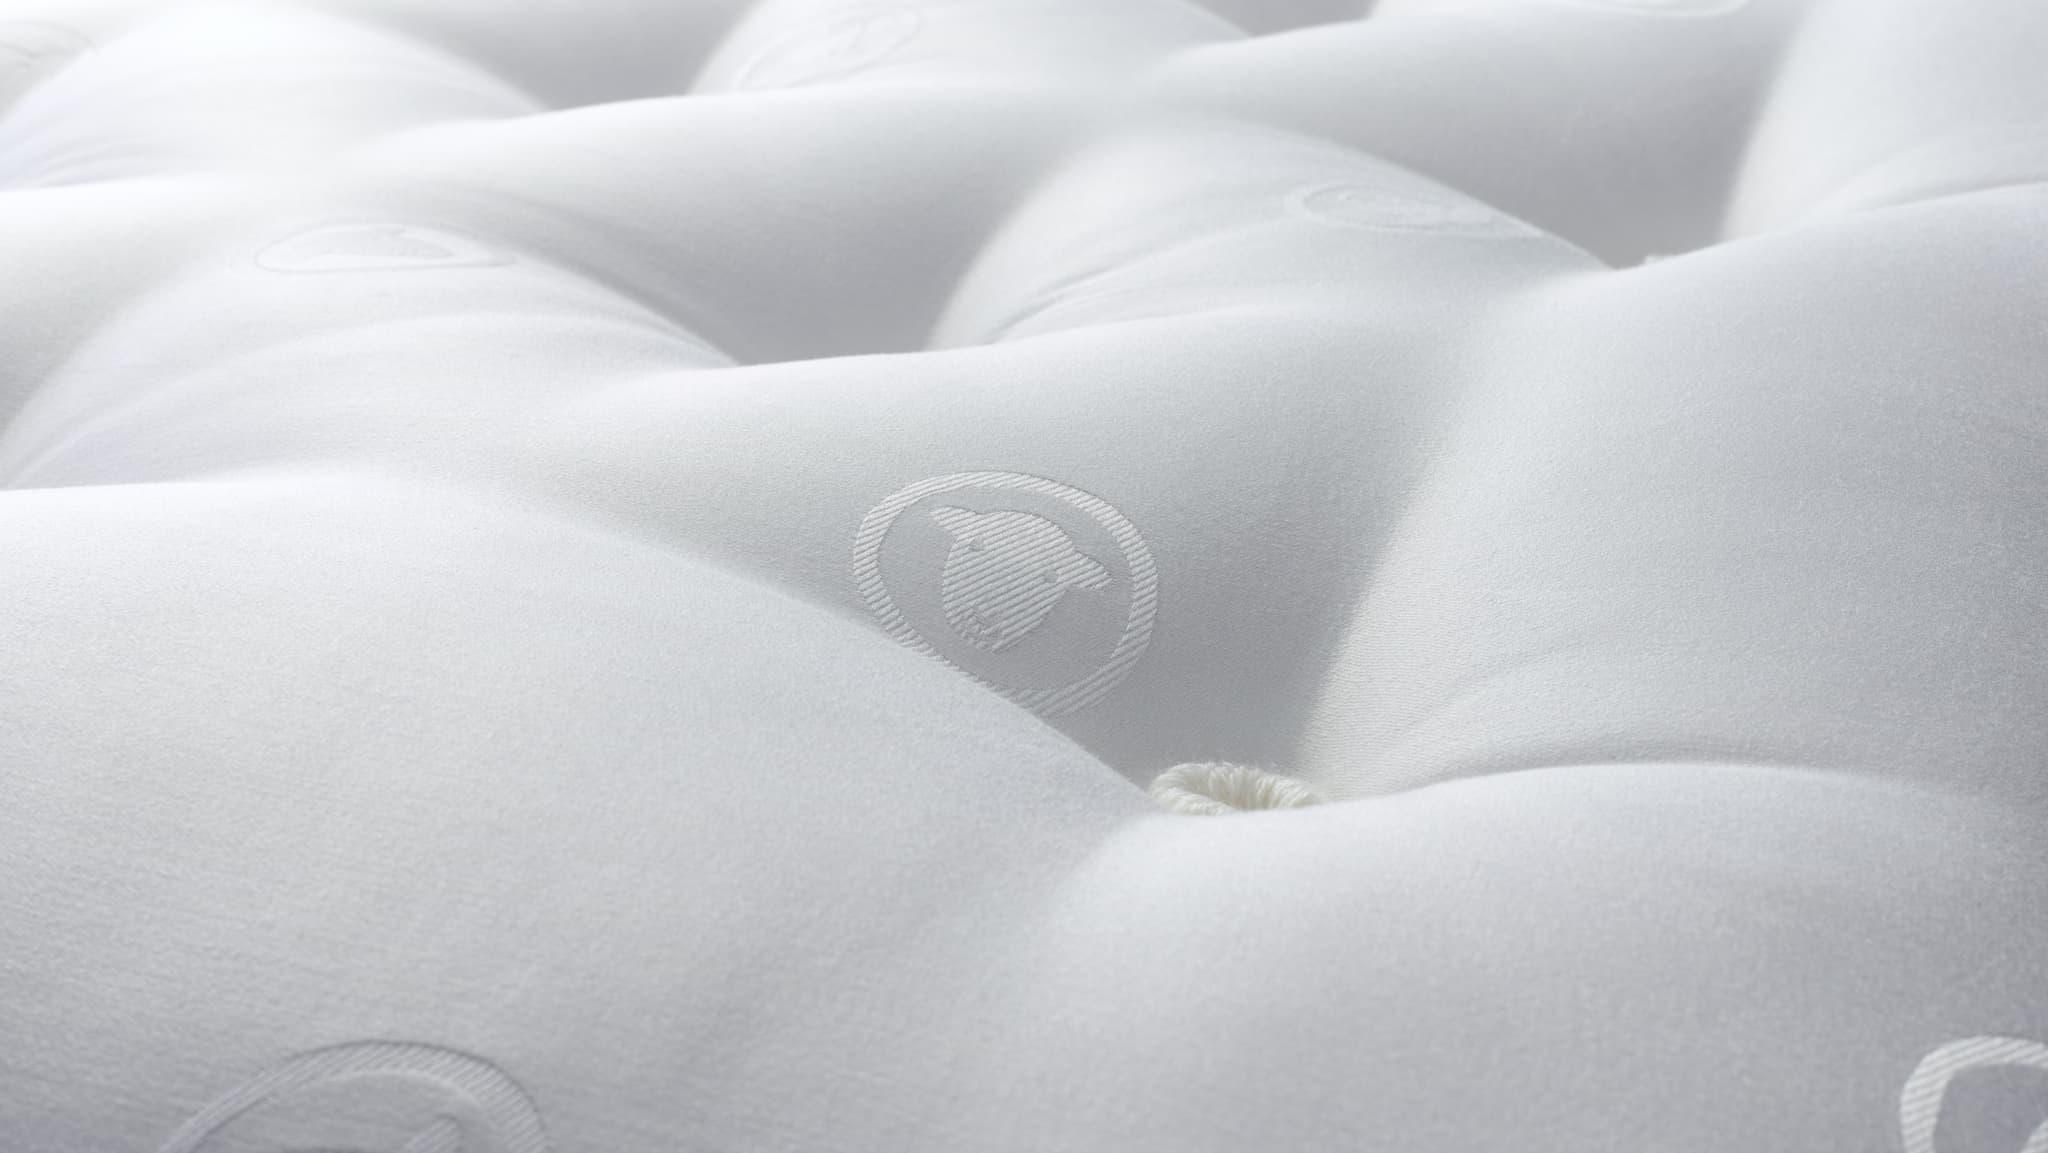 Tufting a mattress